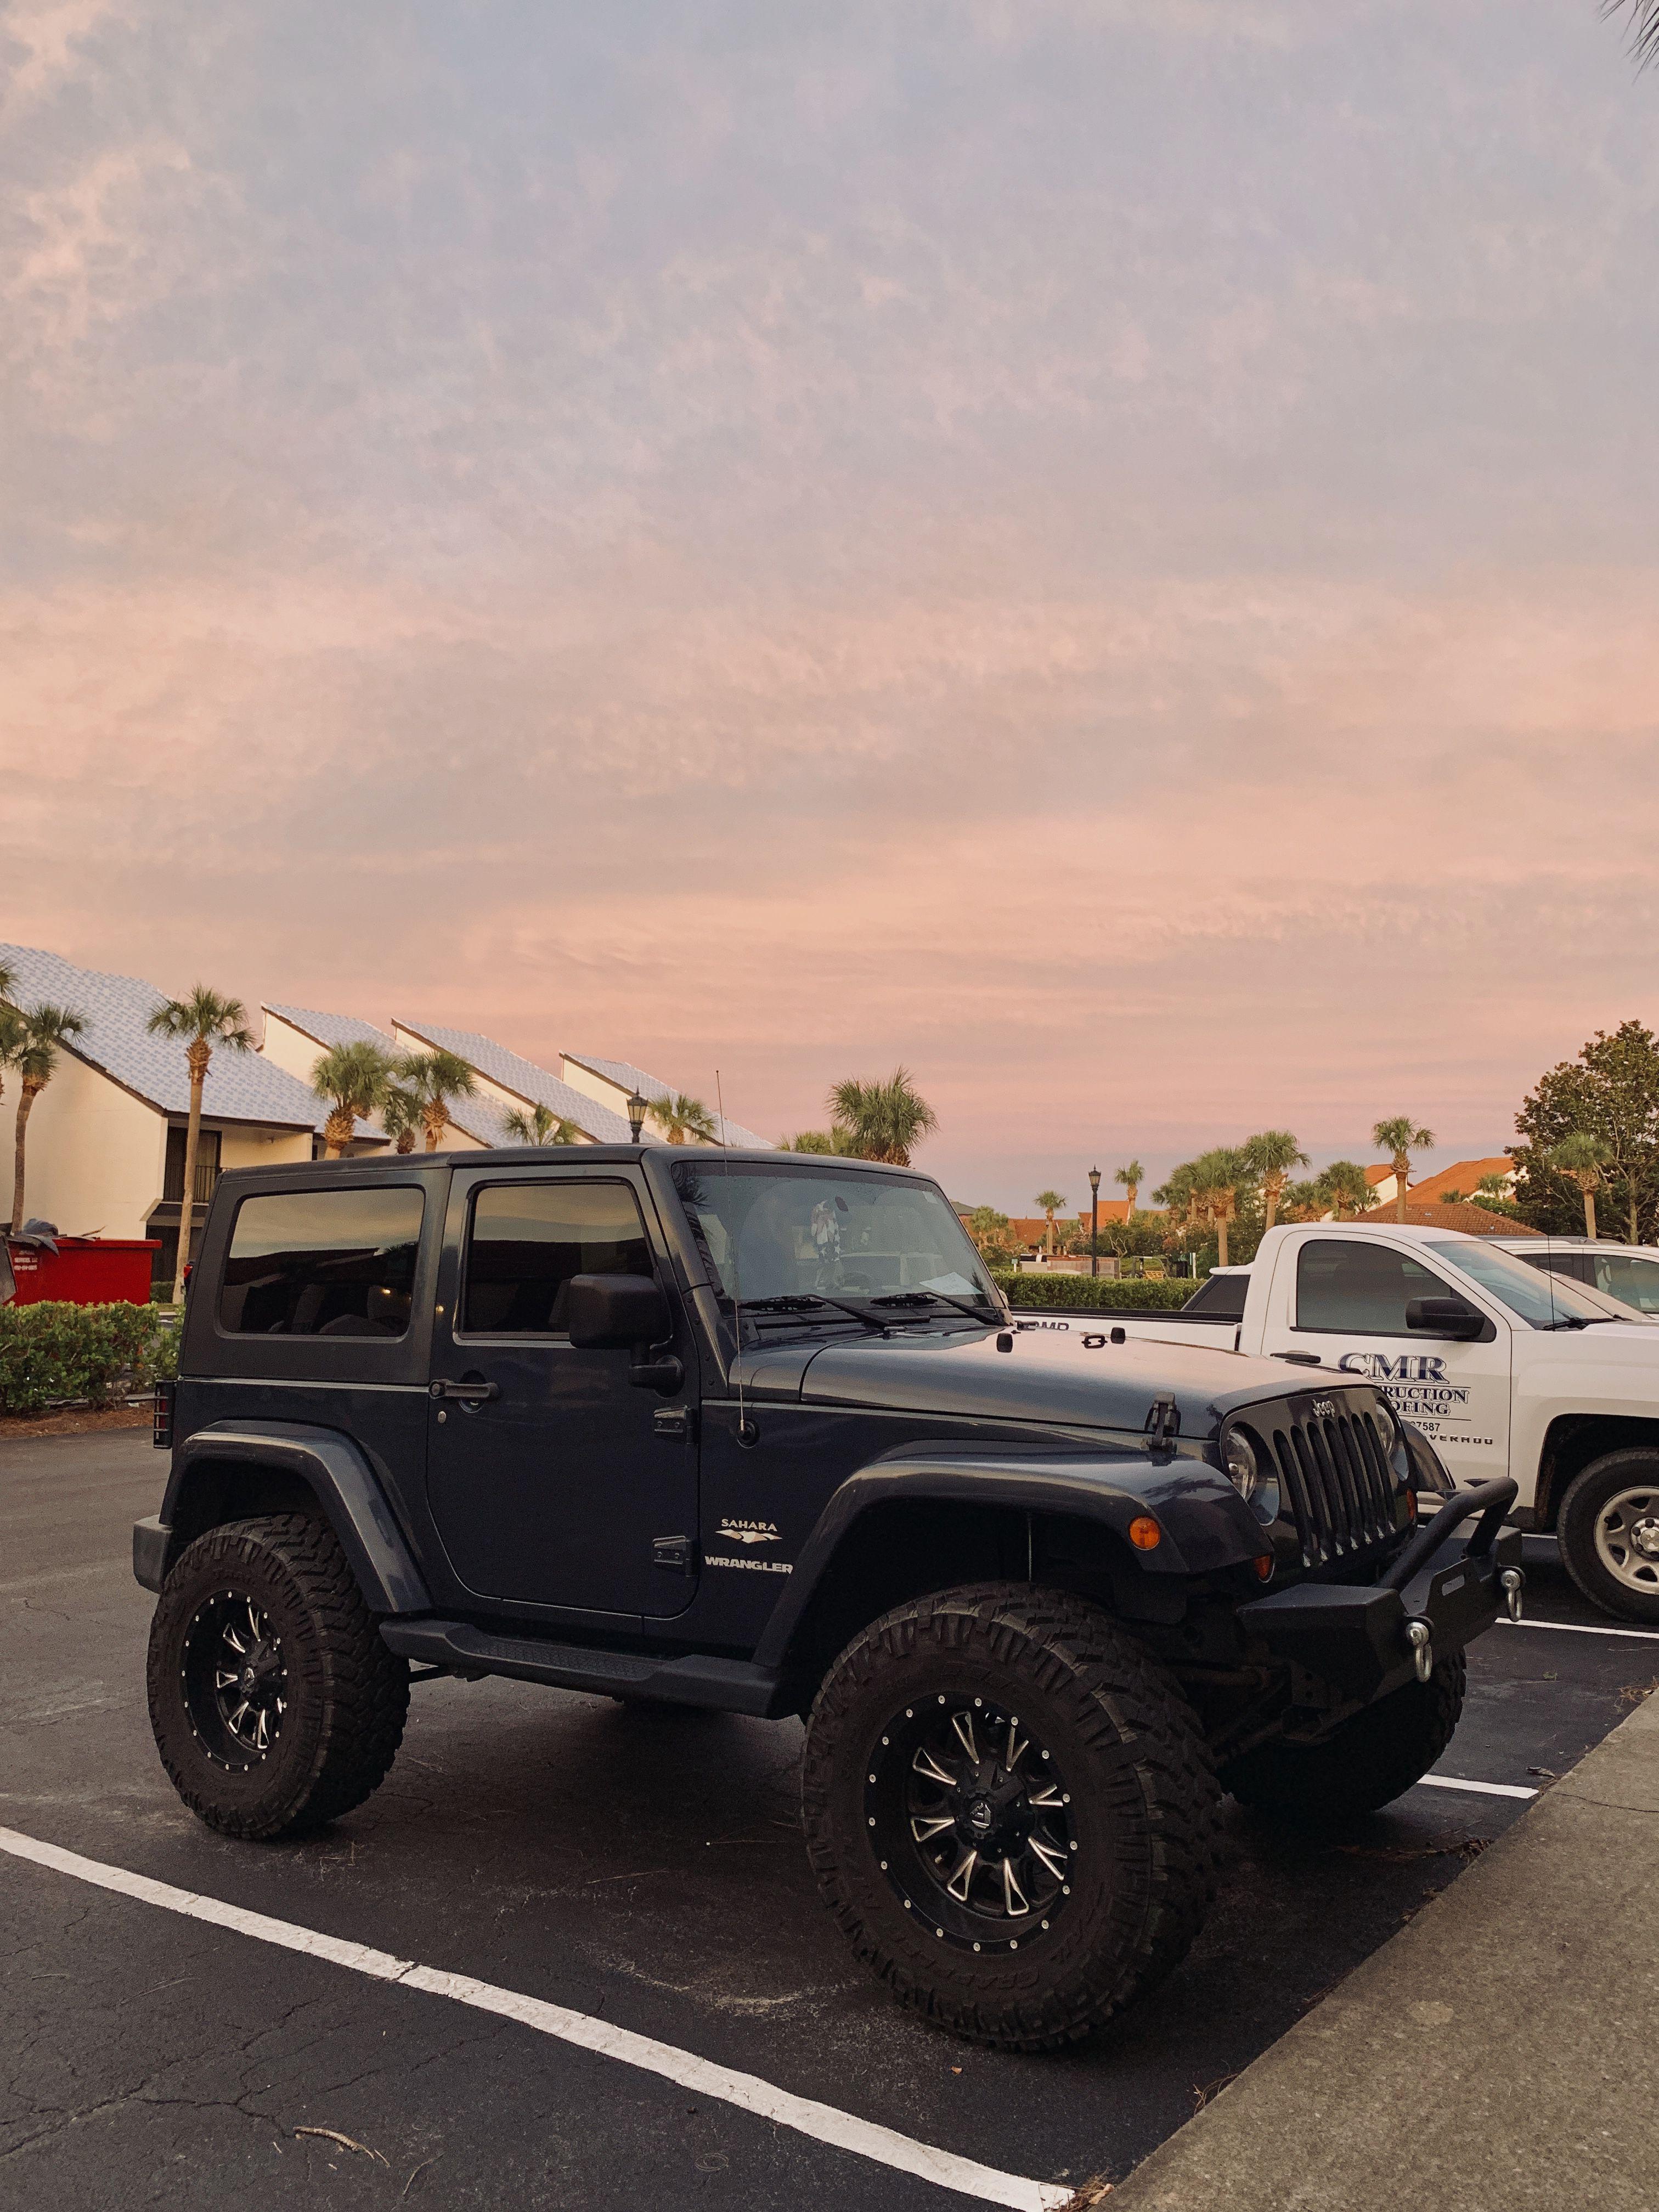 2008 2 Door Jeep Wrangler Sahara Jeep Wrangler Jeep Wrangler